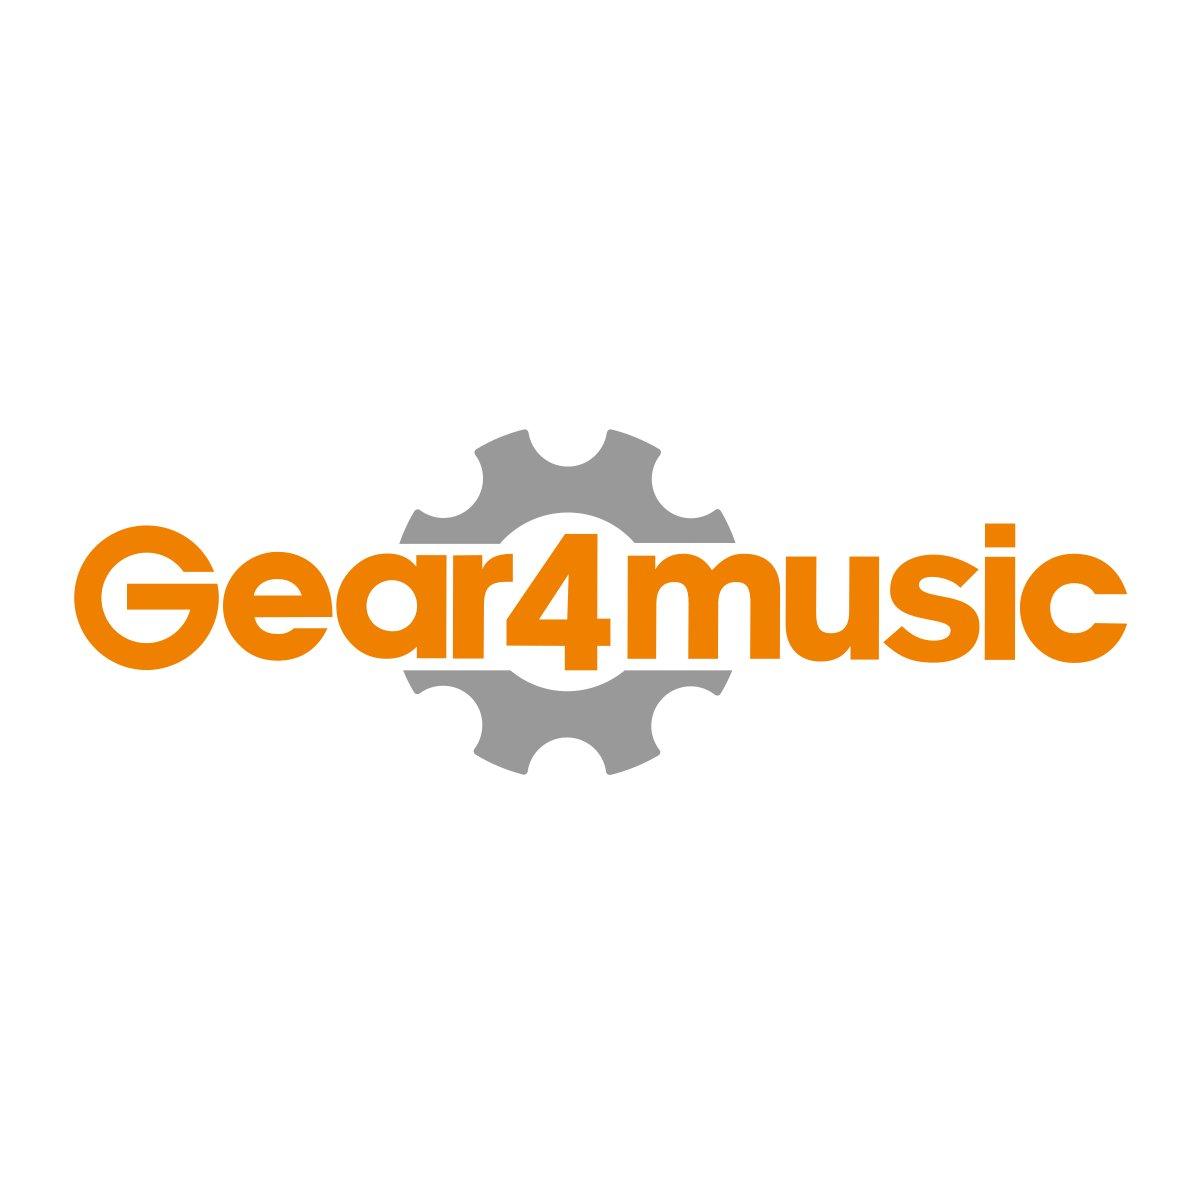 Student Cornet by Gear4music, Light Gold